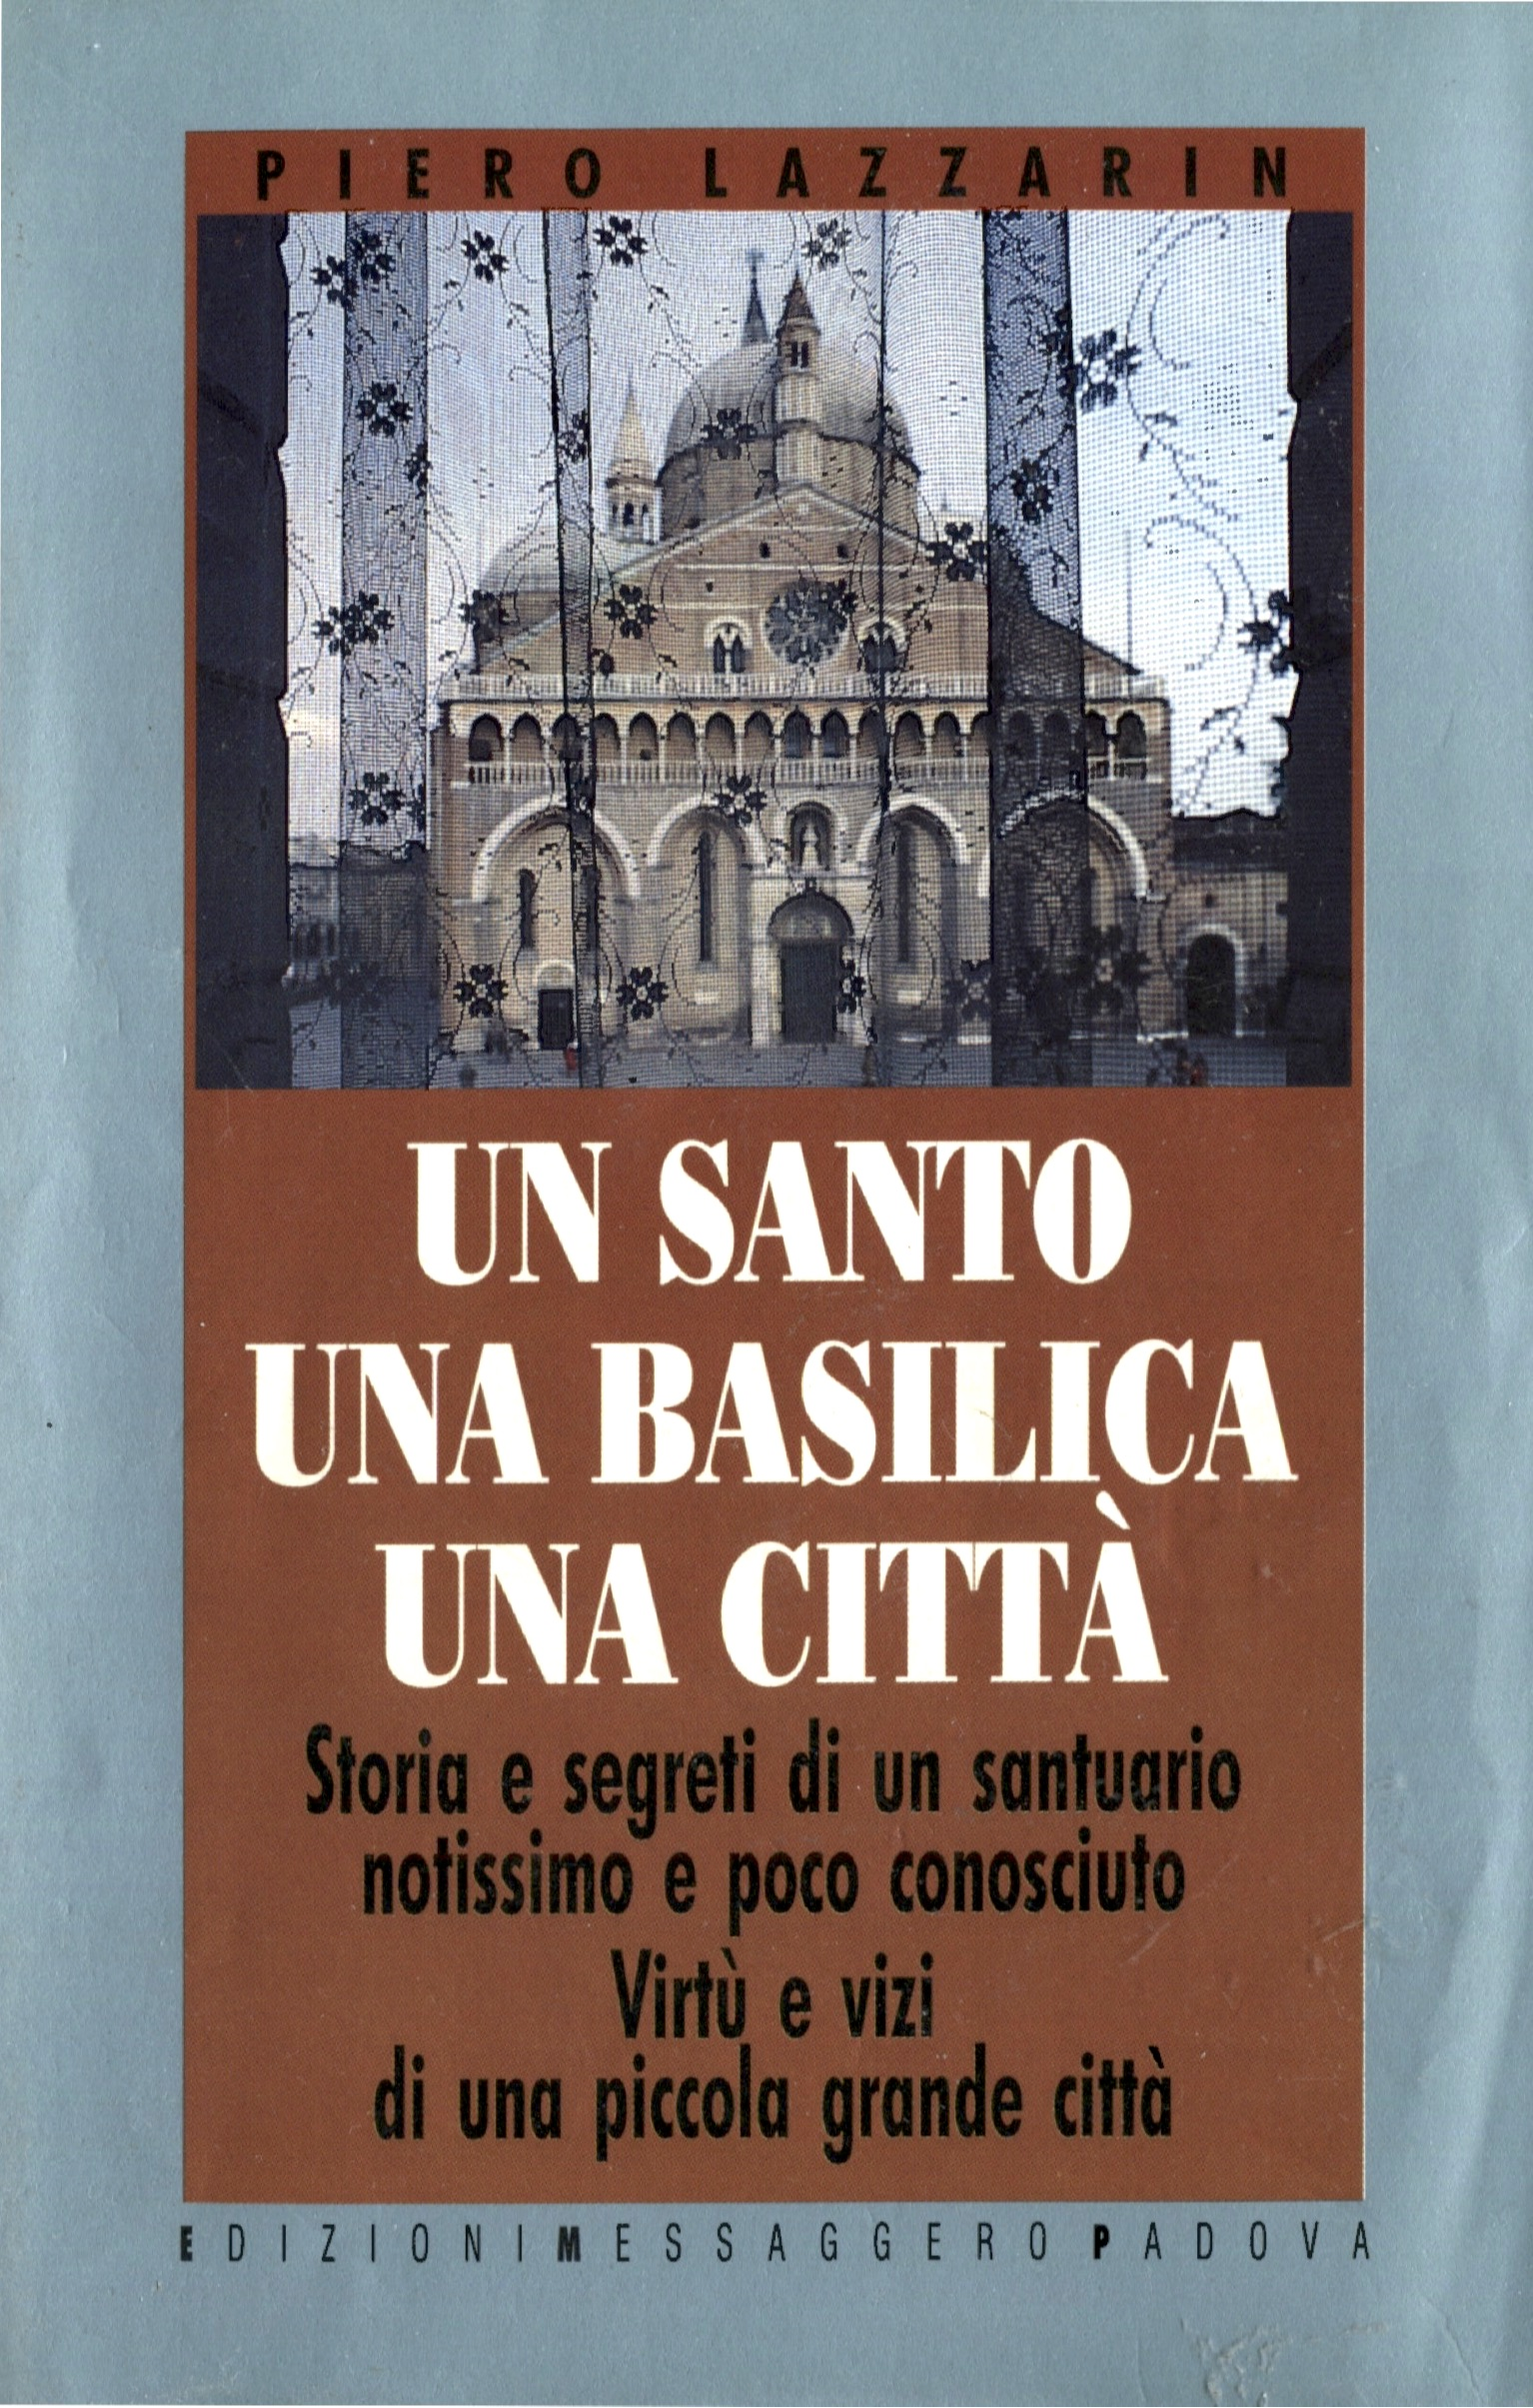 Un santo, una basilica, una citta